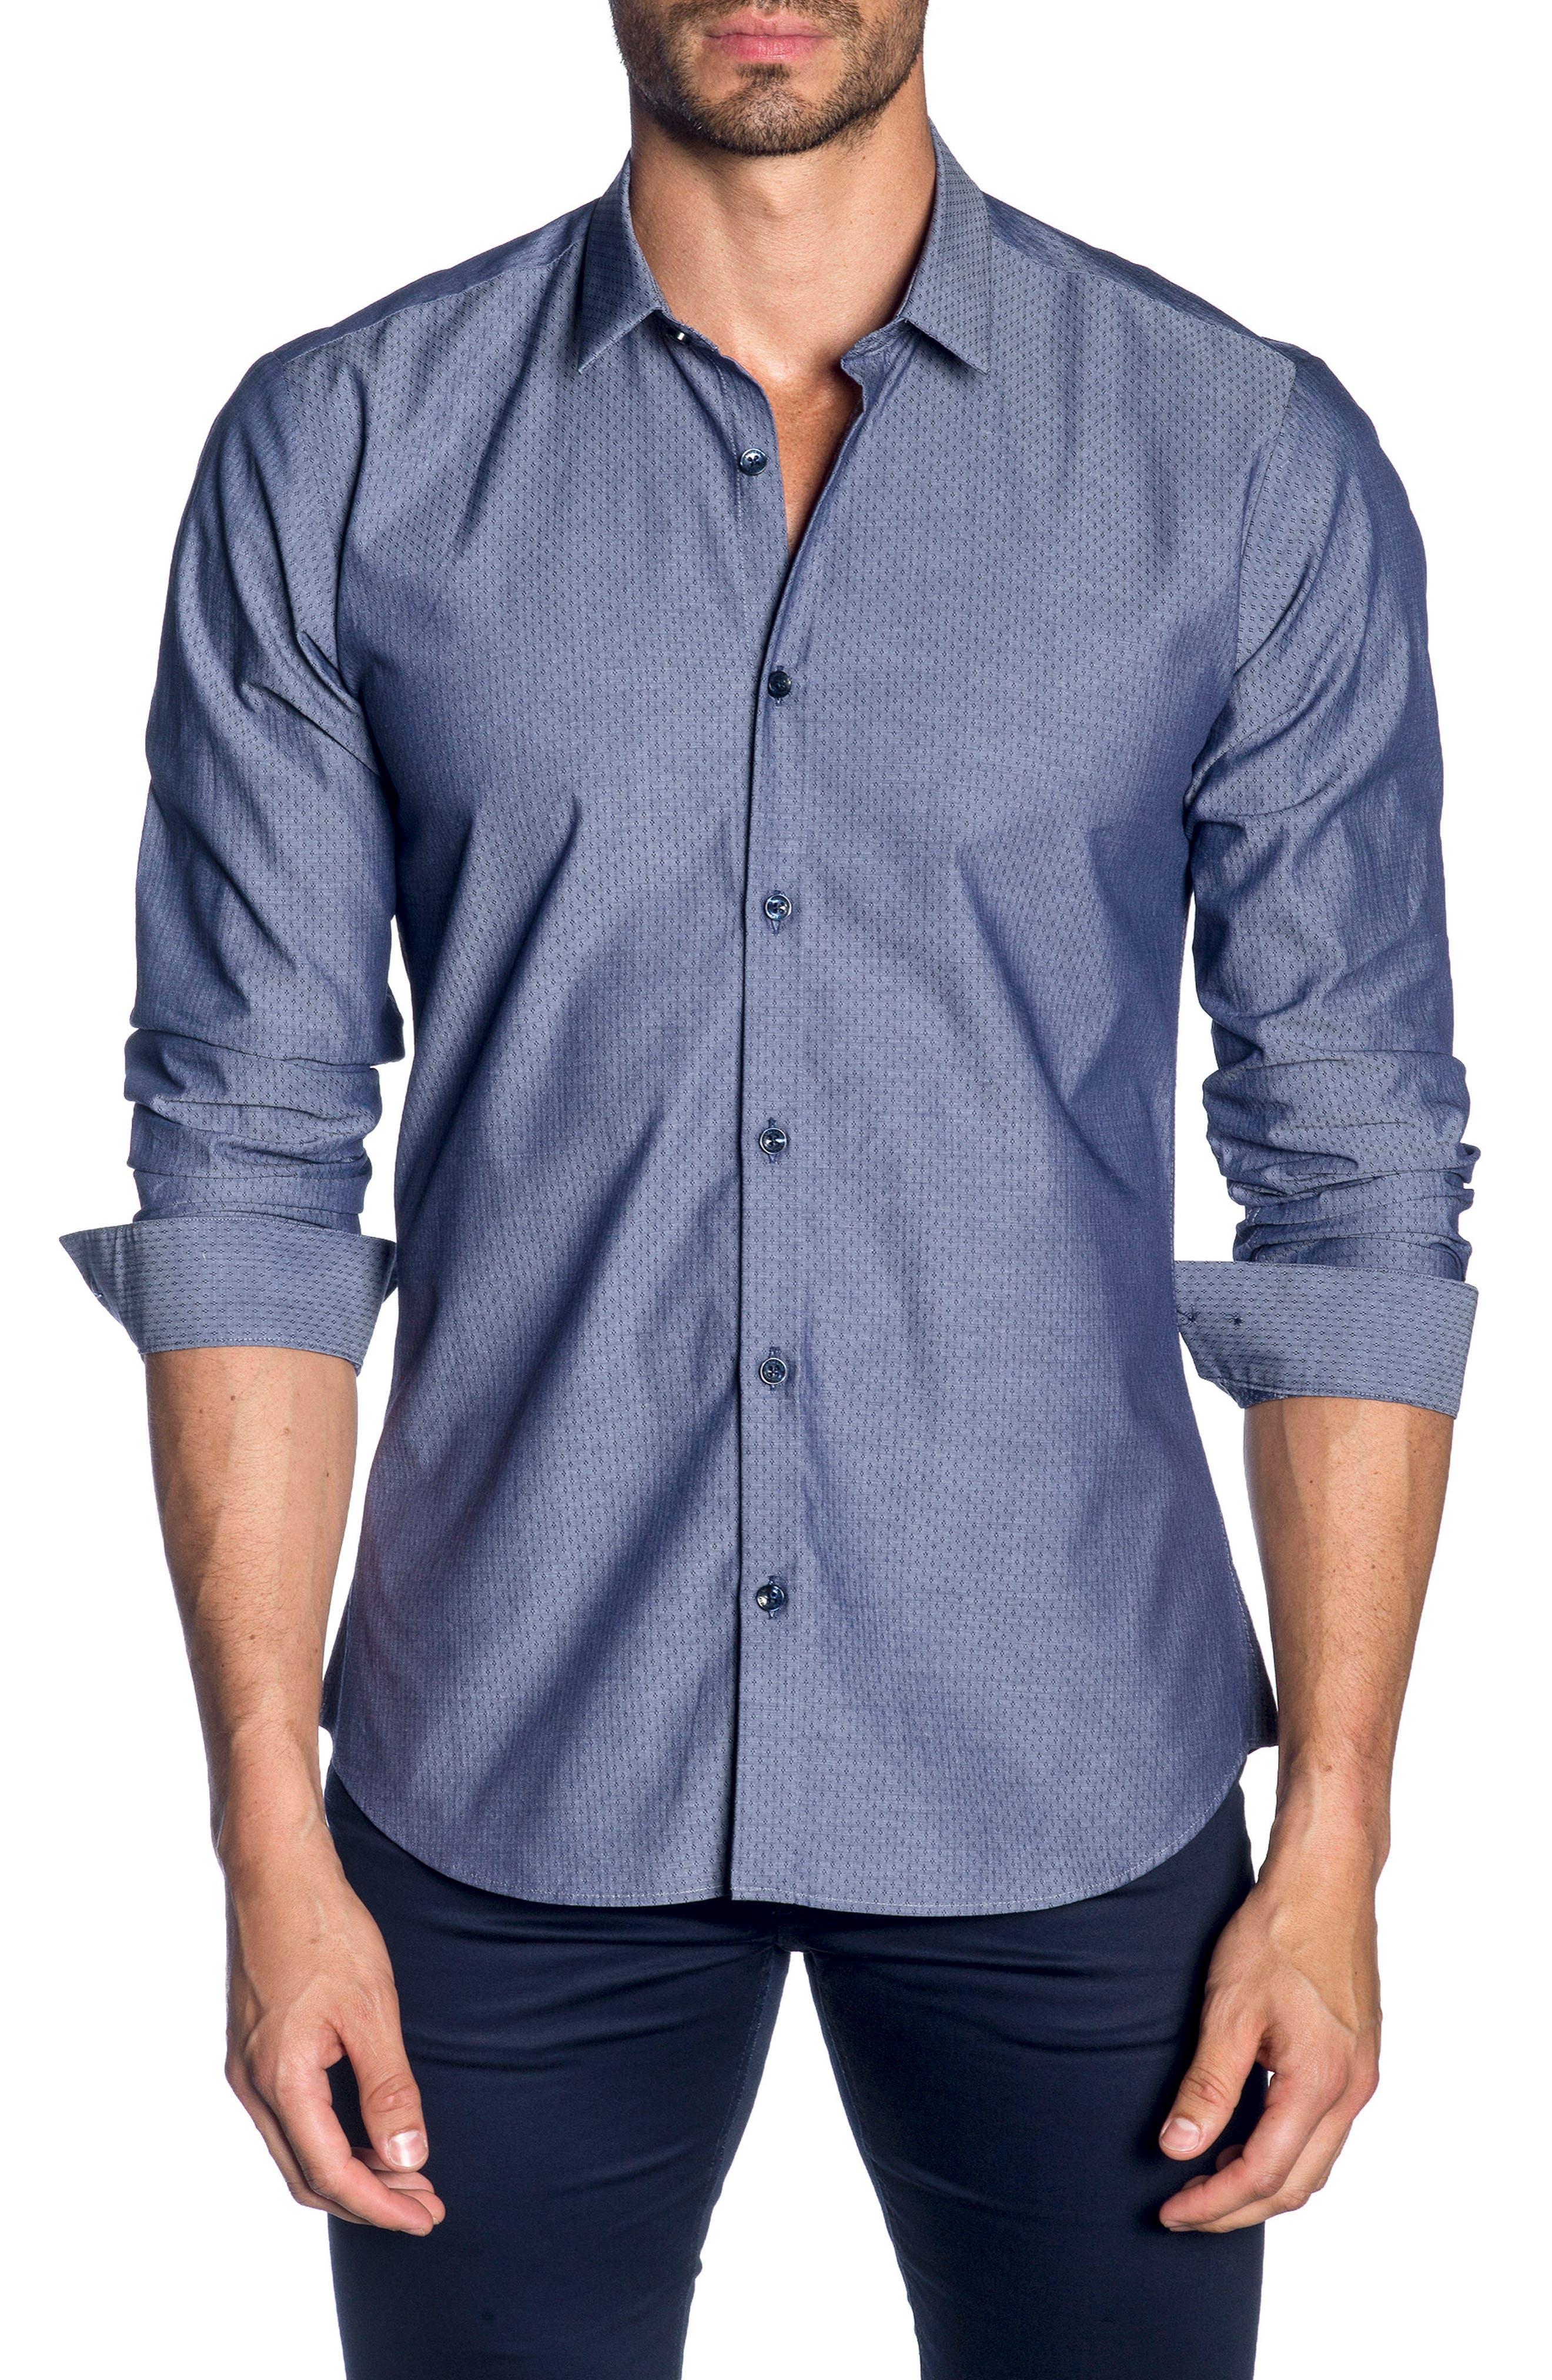 Trim Fit Sport Shirt,                             Main thumbnail 1, color,                             Blue Denim Jacquard